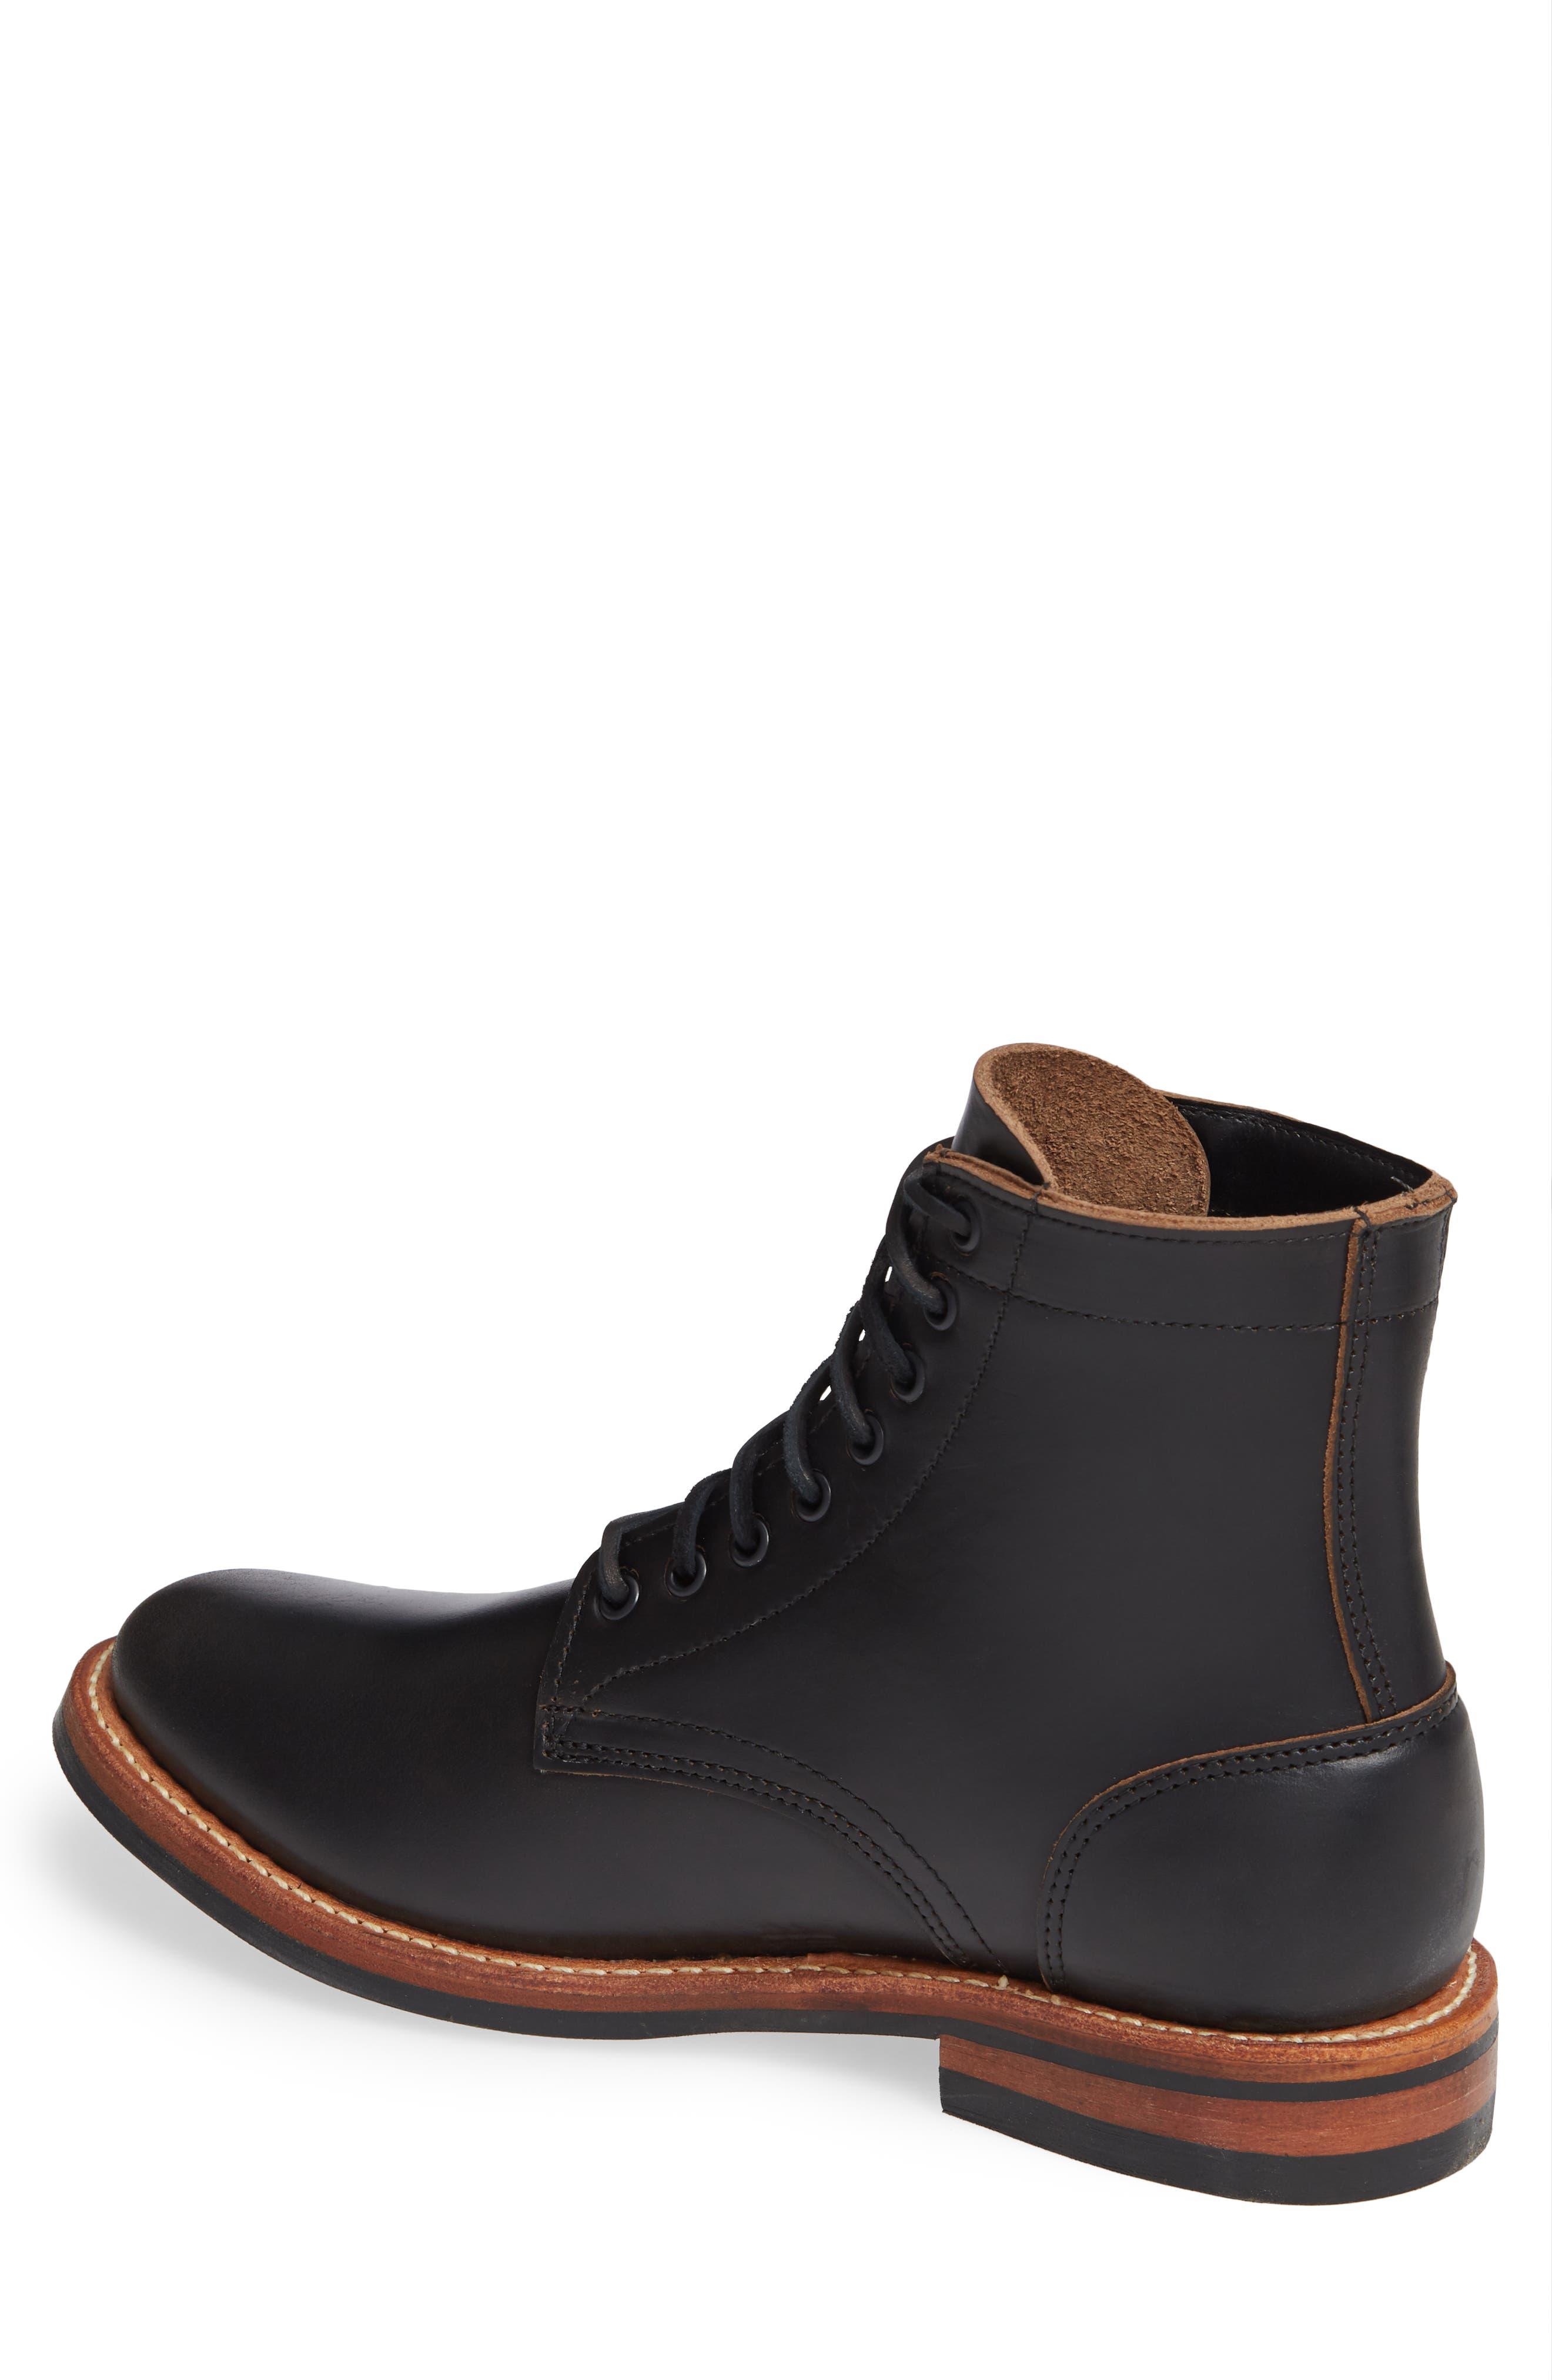 Trench Plain Toe boot,                             Alternate thumbnail 2, color,                             BLACK LEATHER